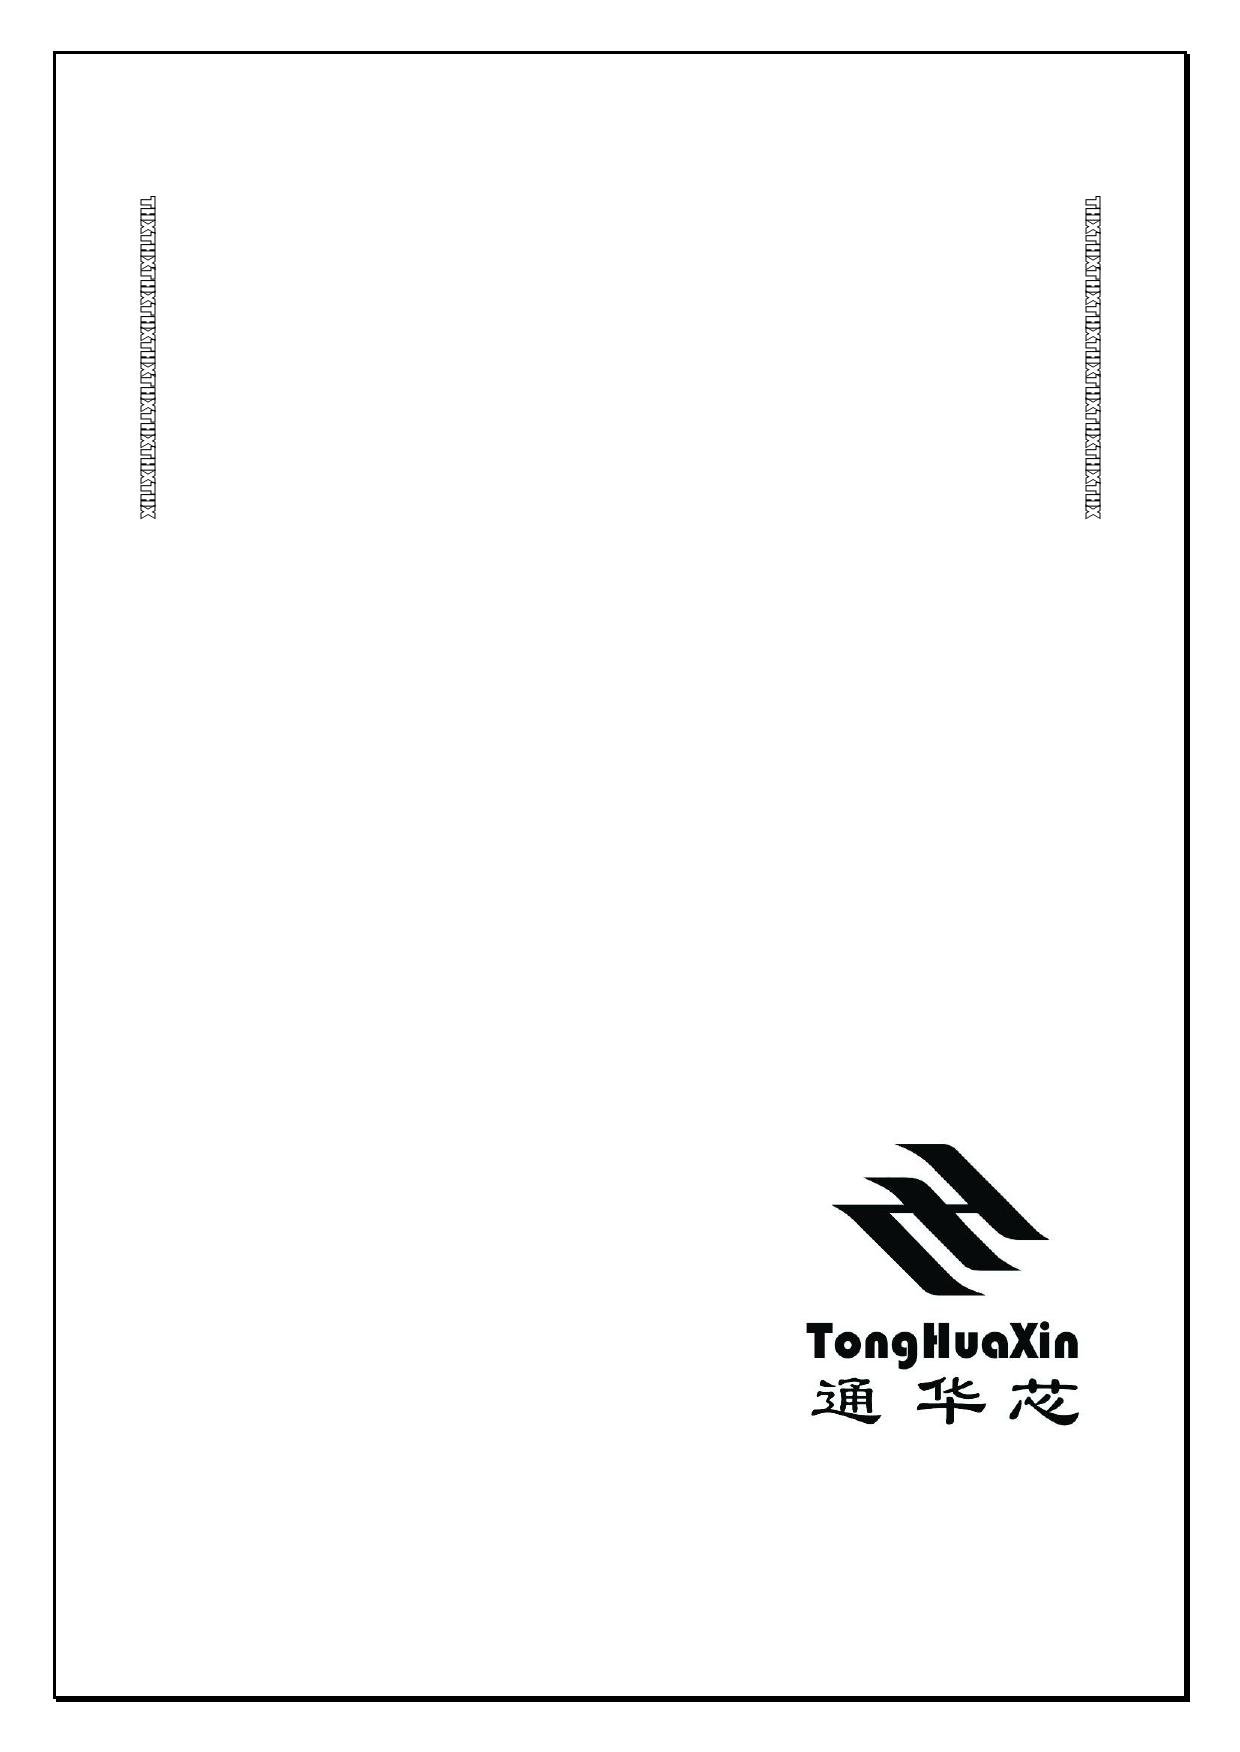 THX208 image